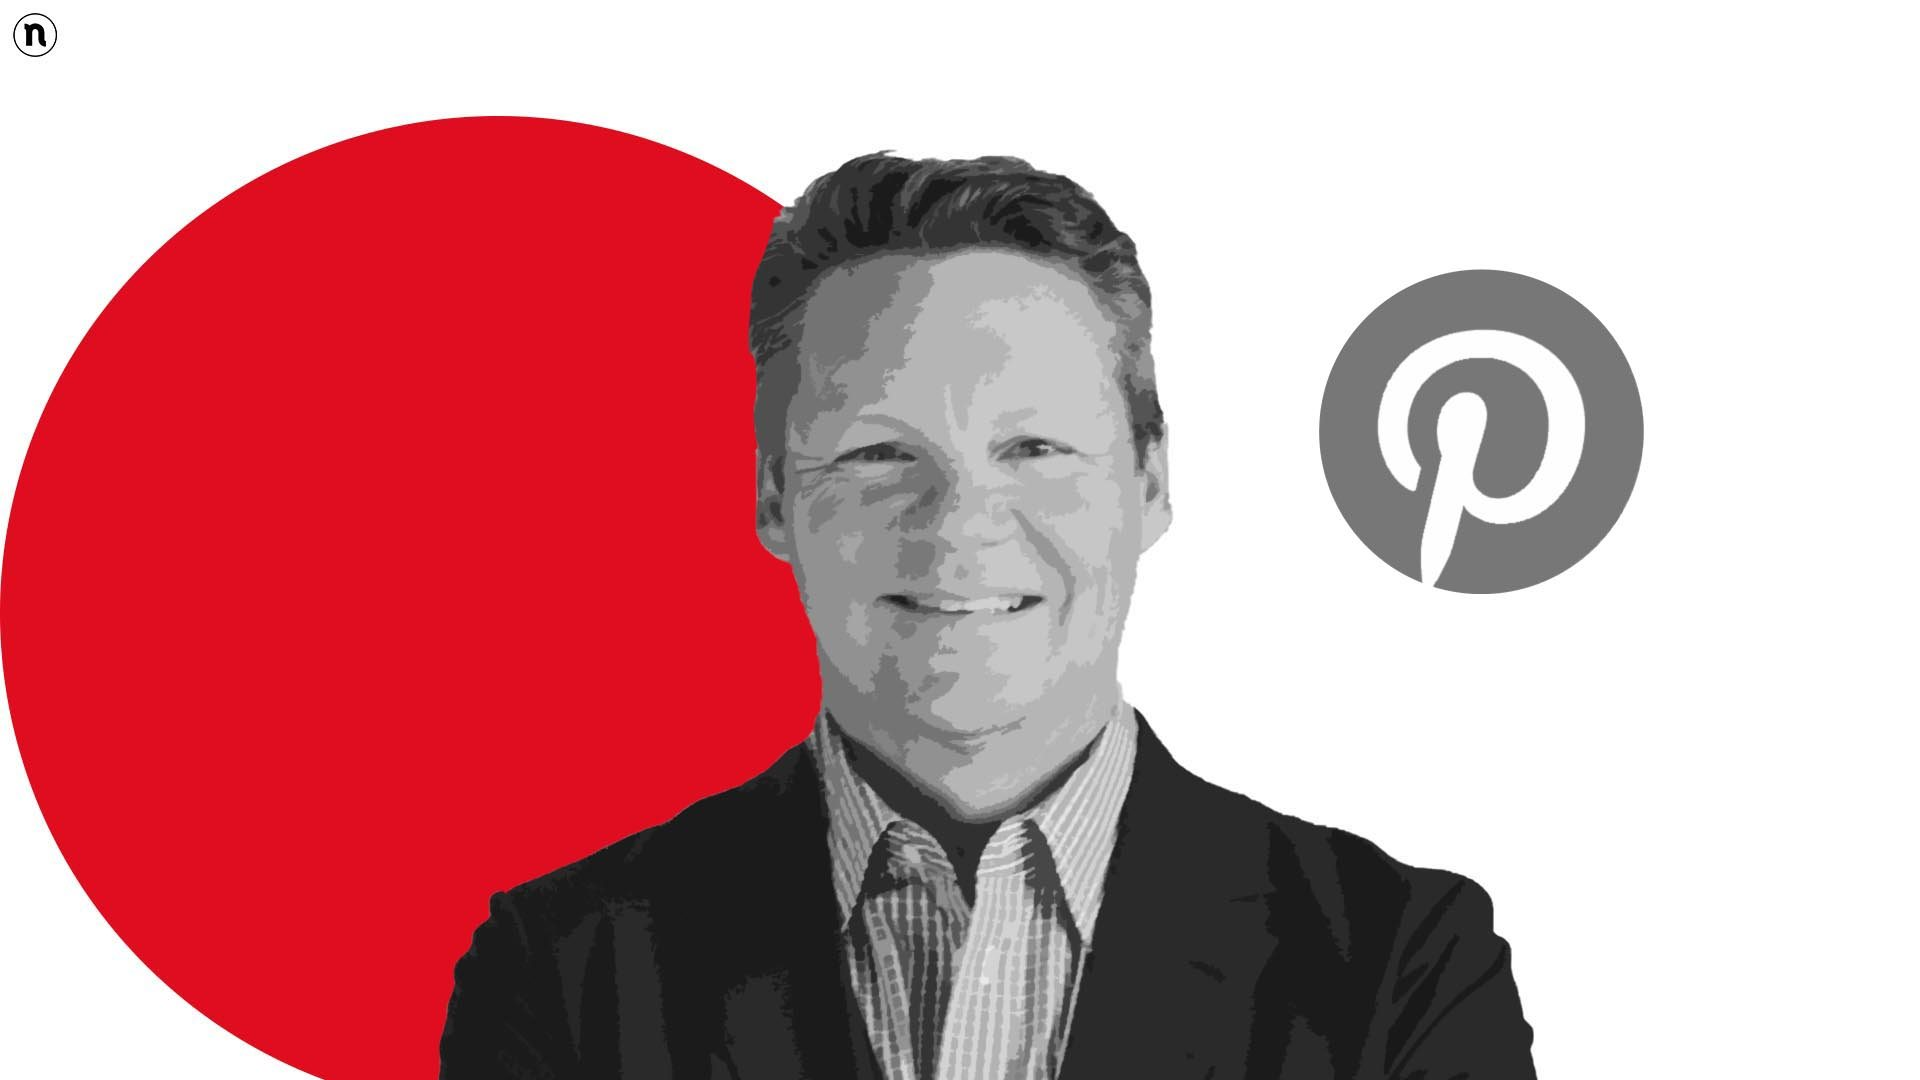 Focus inclusività: a tu per tu con Jeremy King, SVP of Tech at Pinterest